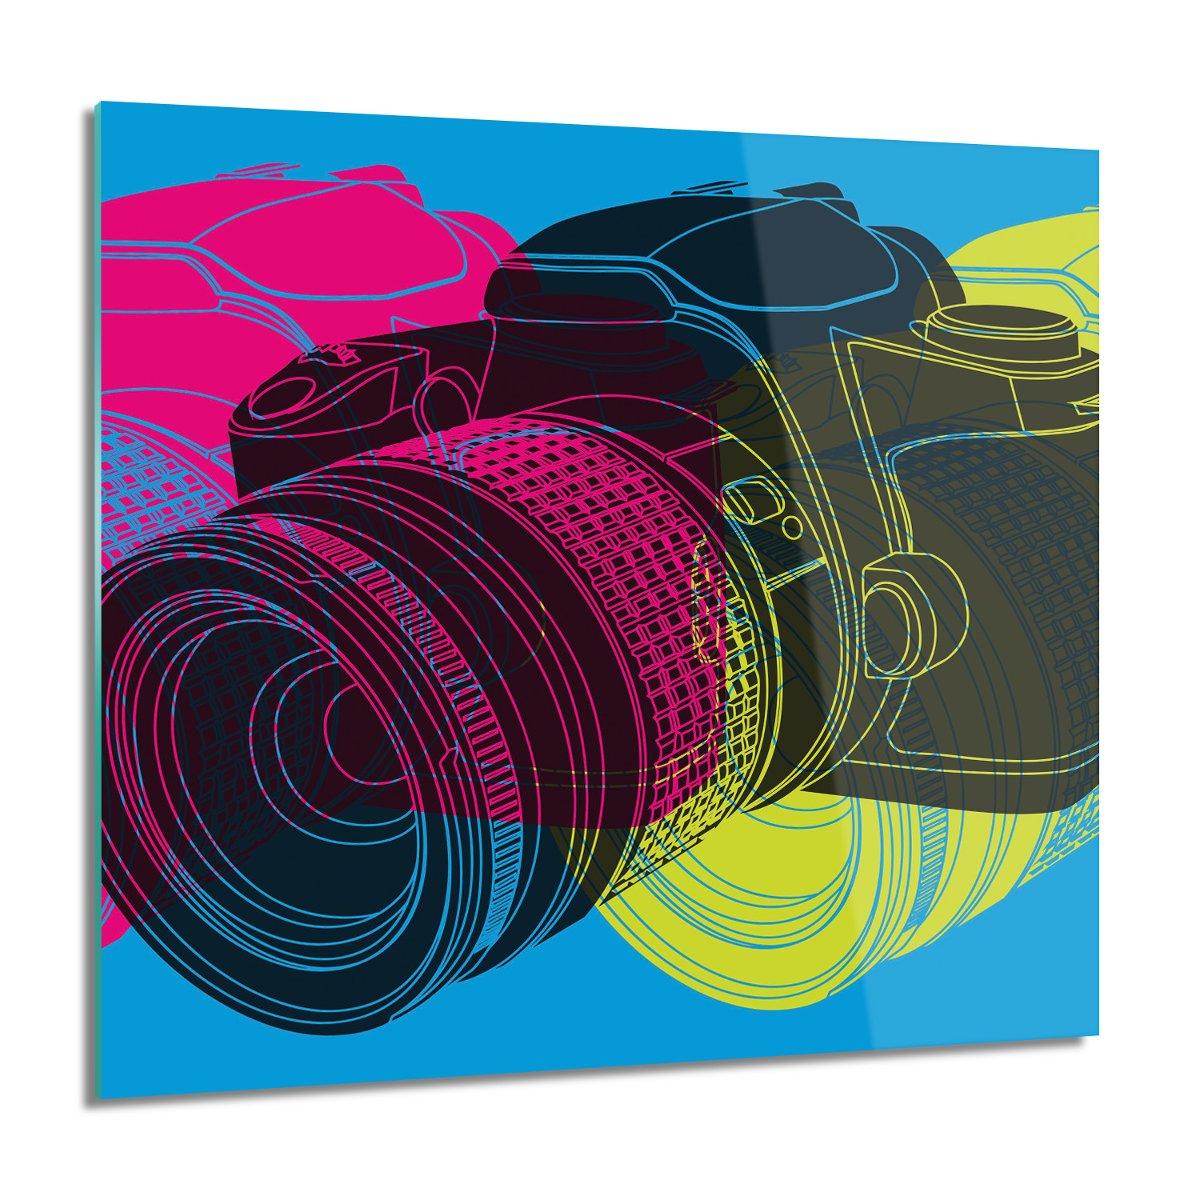 Lustrzanka aparat do salonu Foto szklane 60x60, ArtprintCave